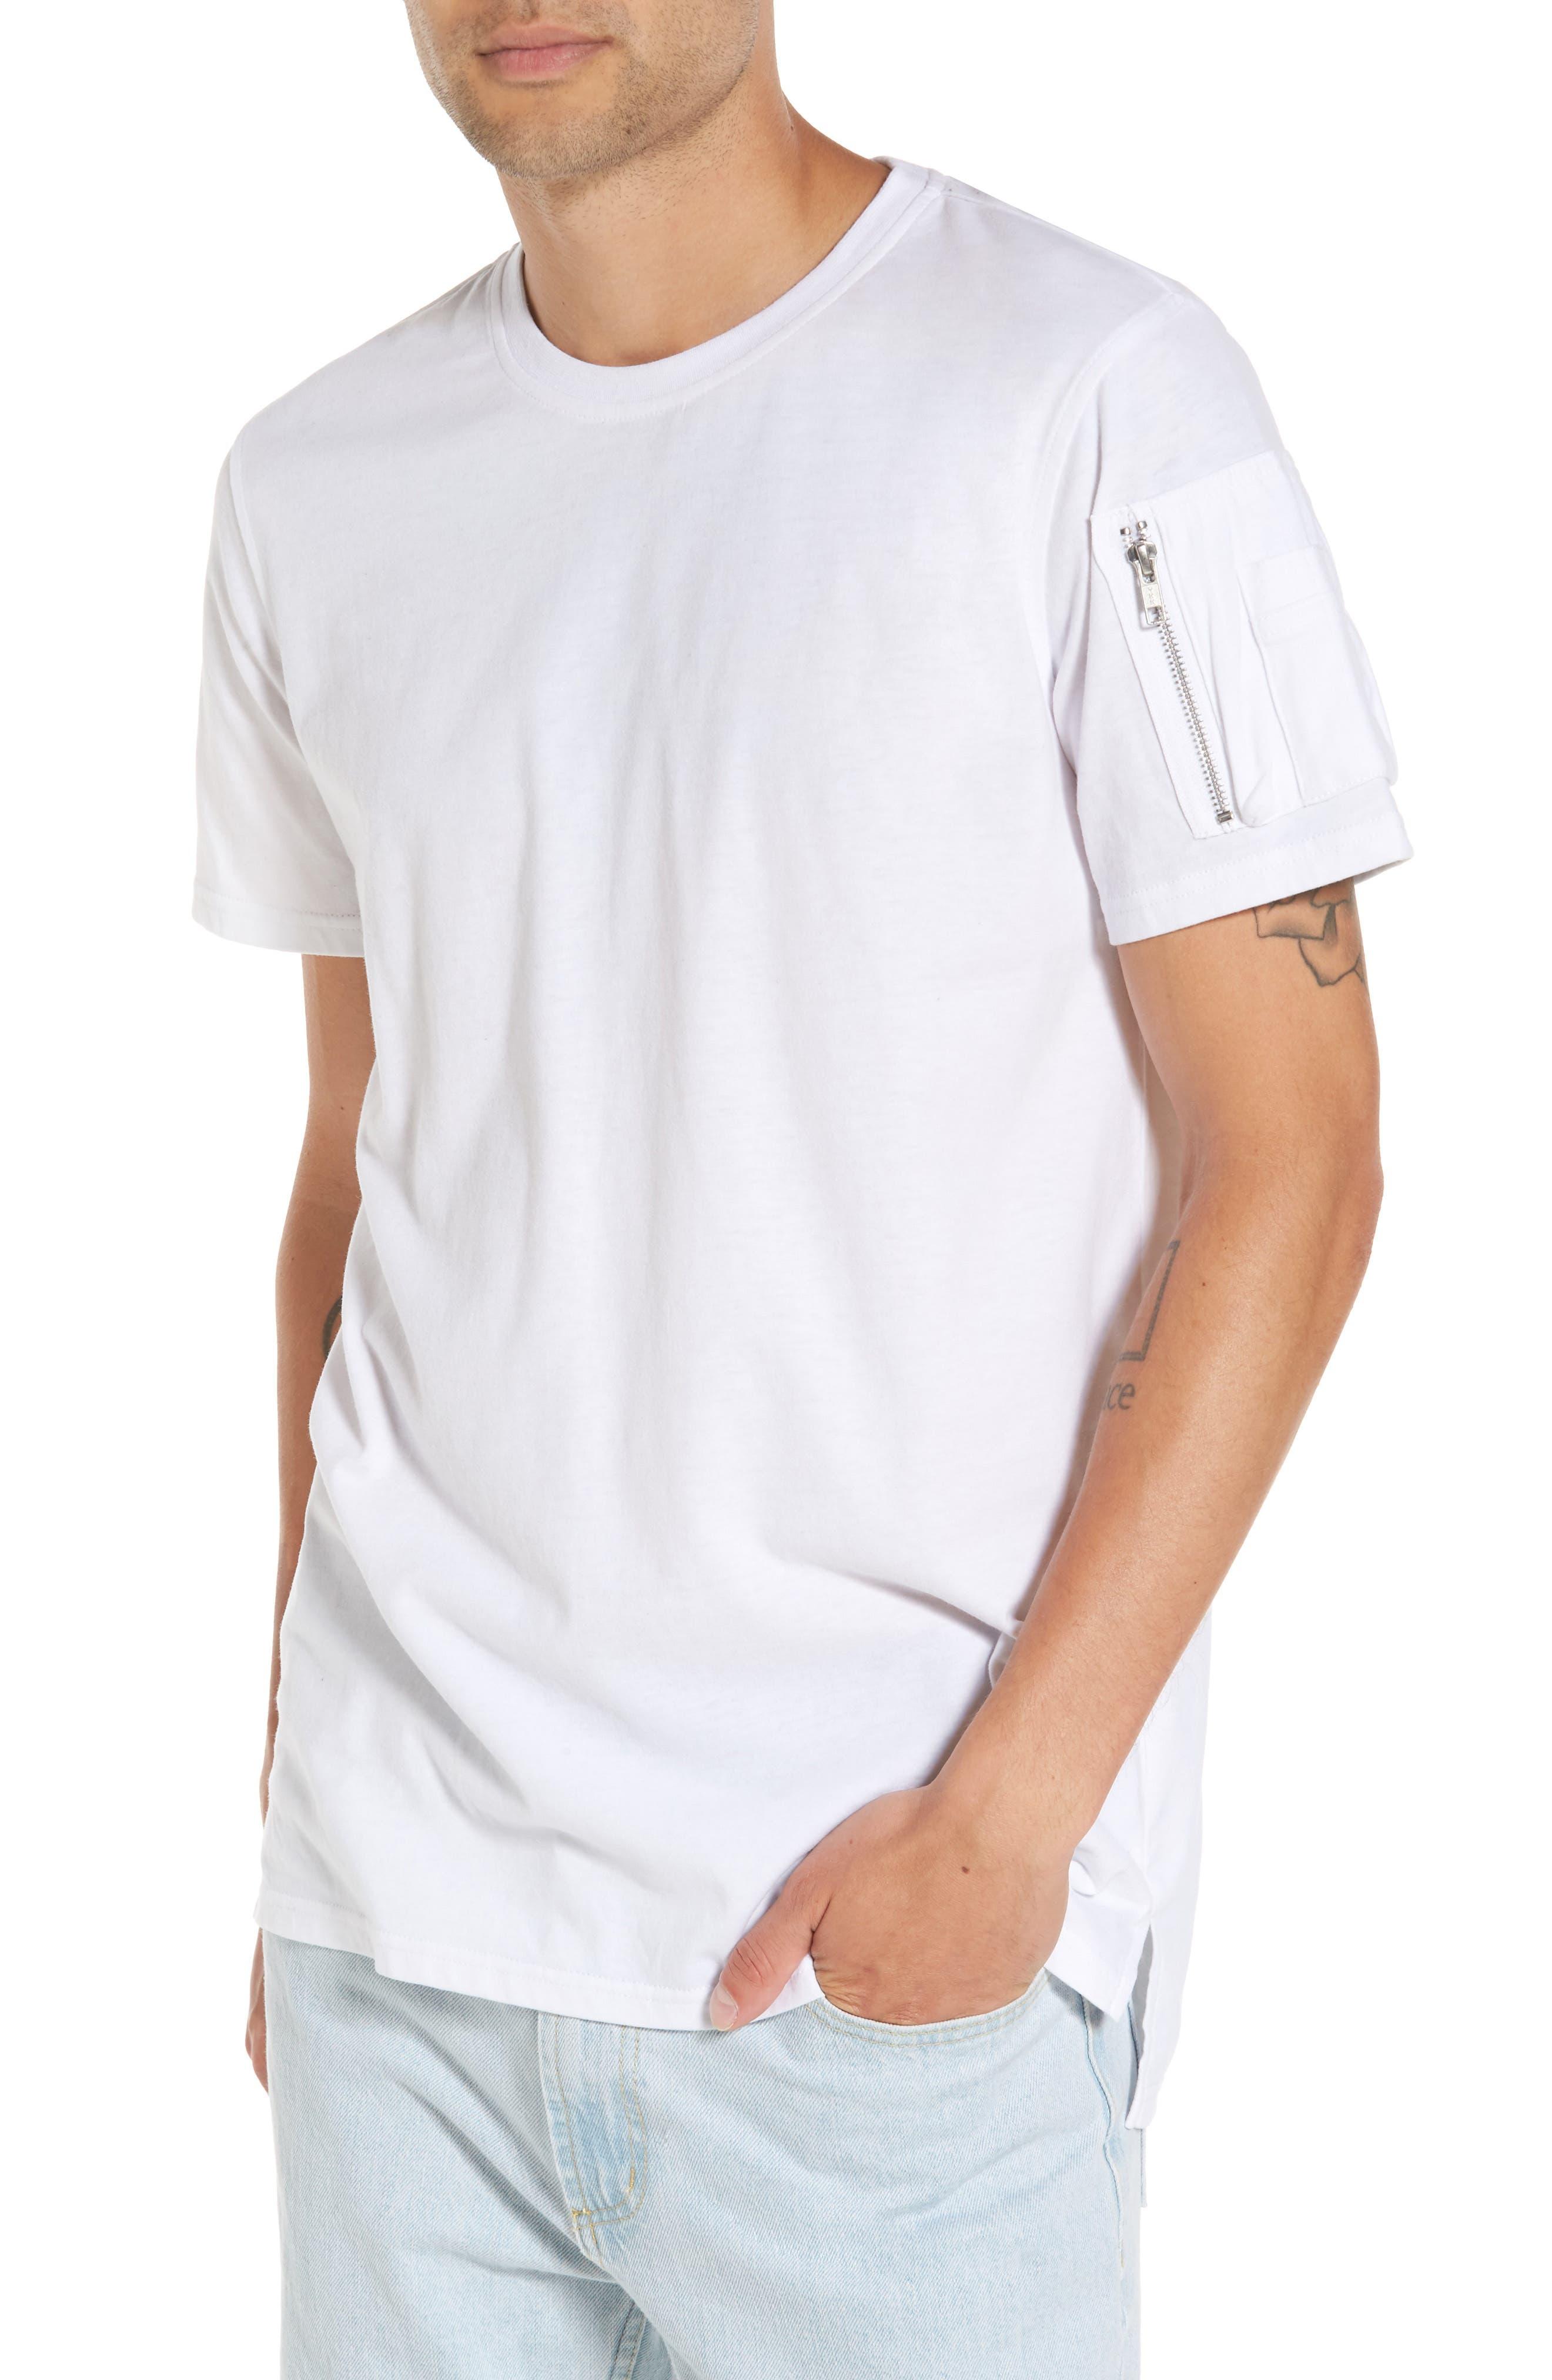 The Rail Zip Pocket T-Shirt